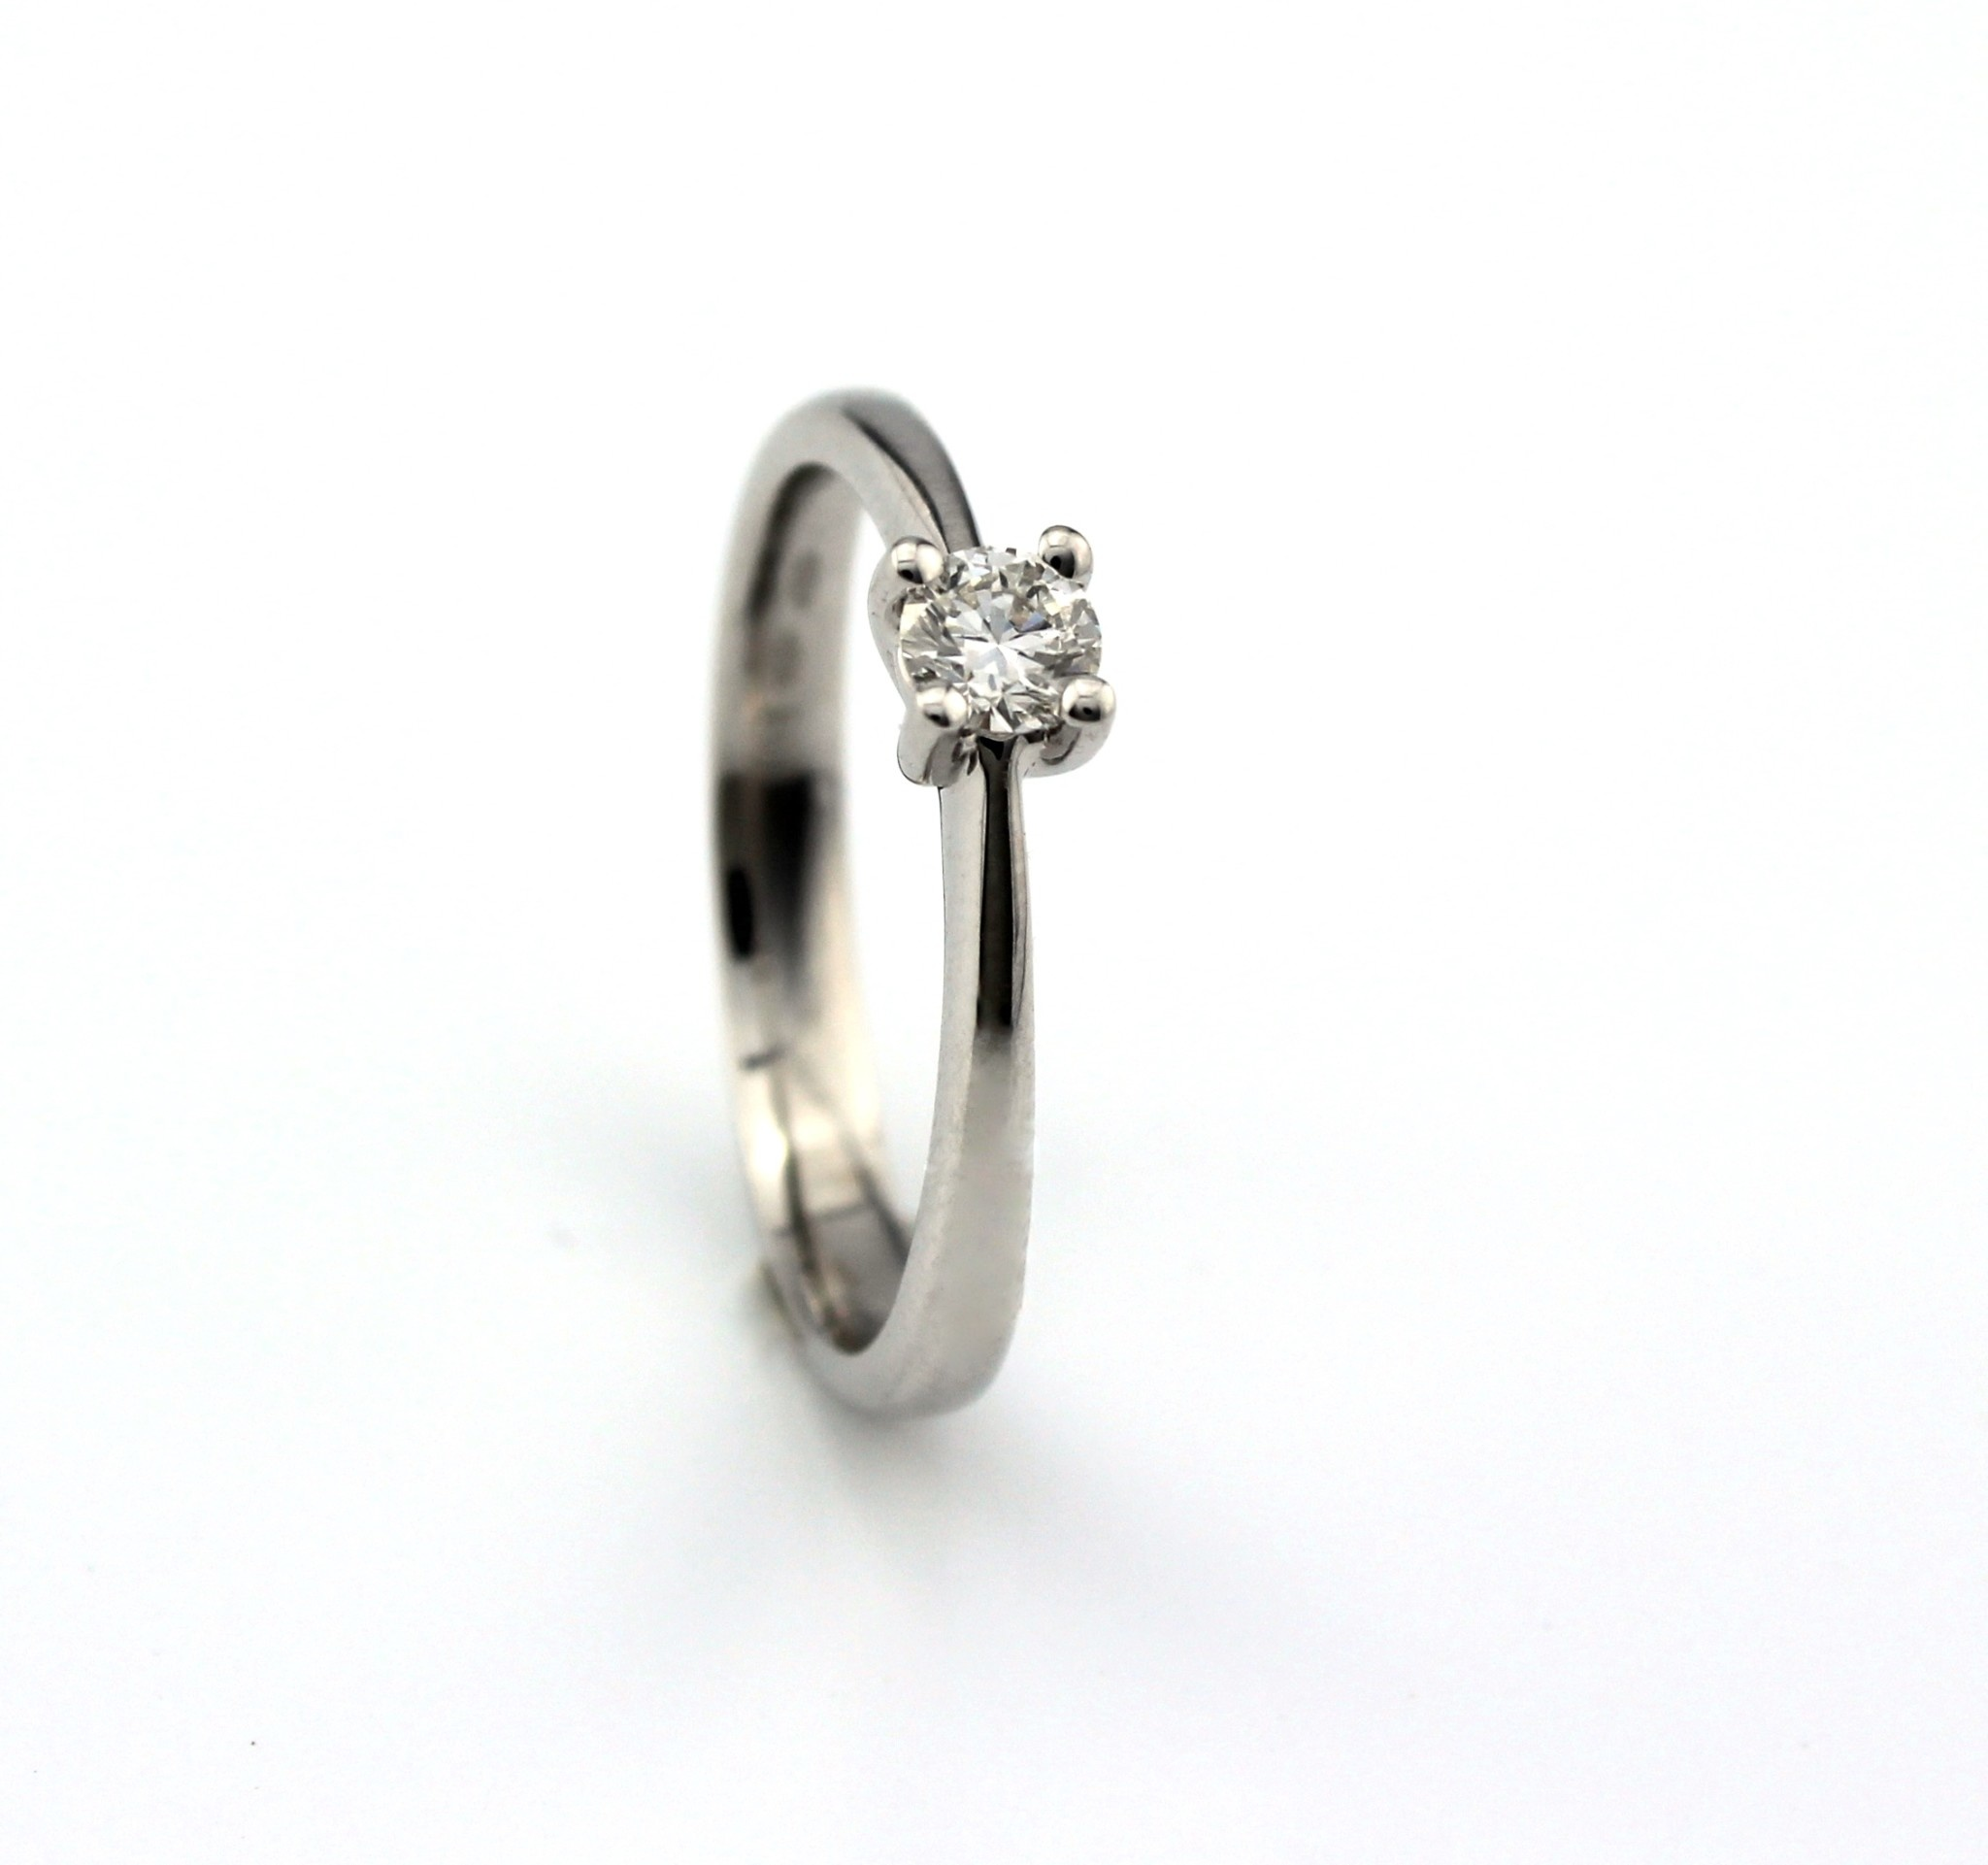 Passione Passione ring GD1791 0.20ct